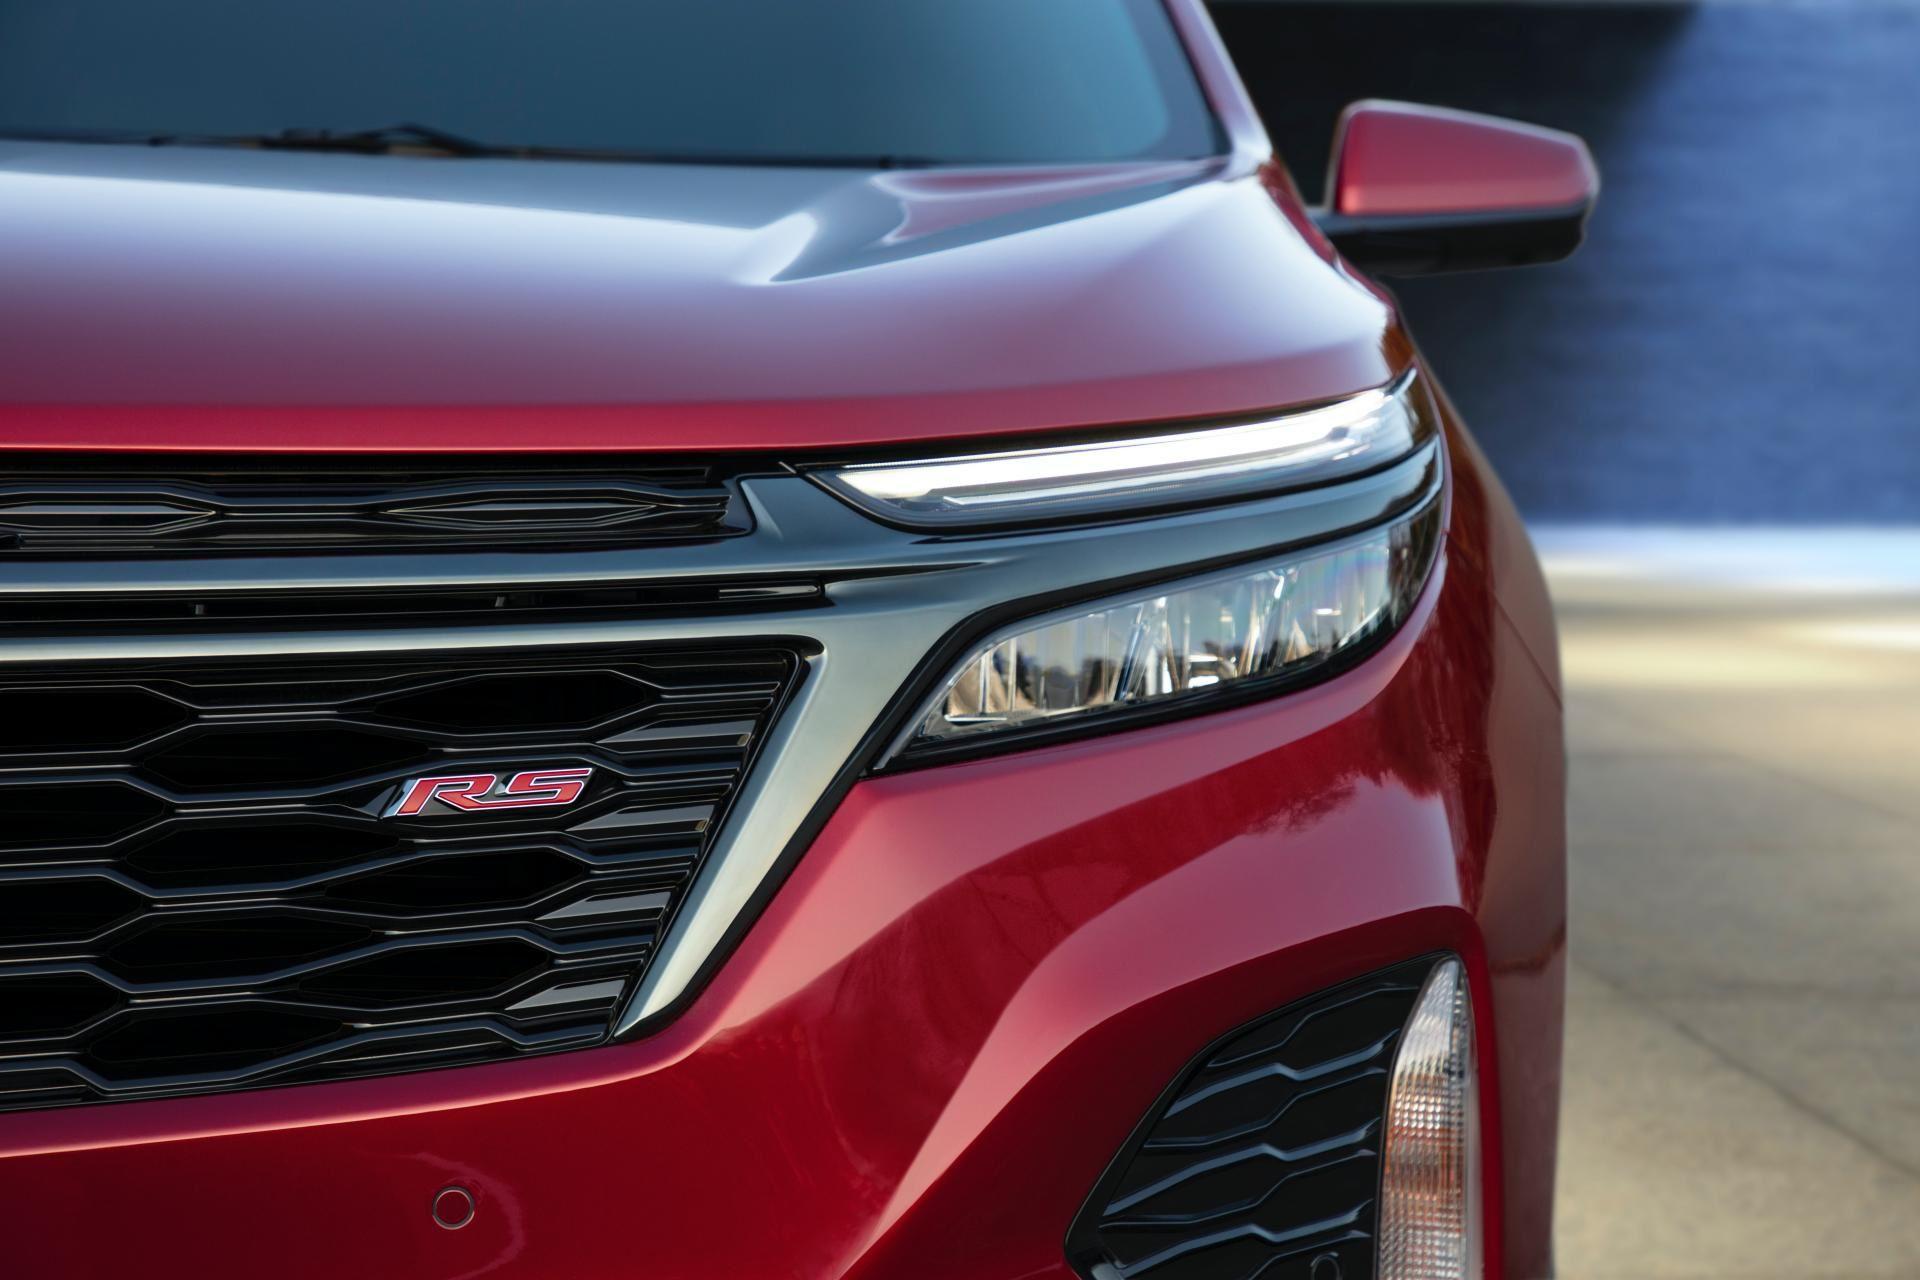 Chevrolet-Equinox-facelift-2020-10